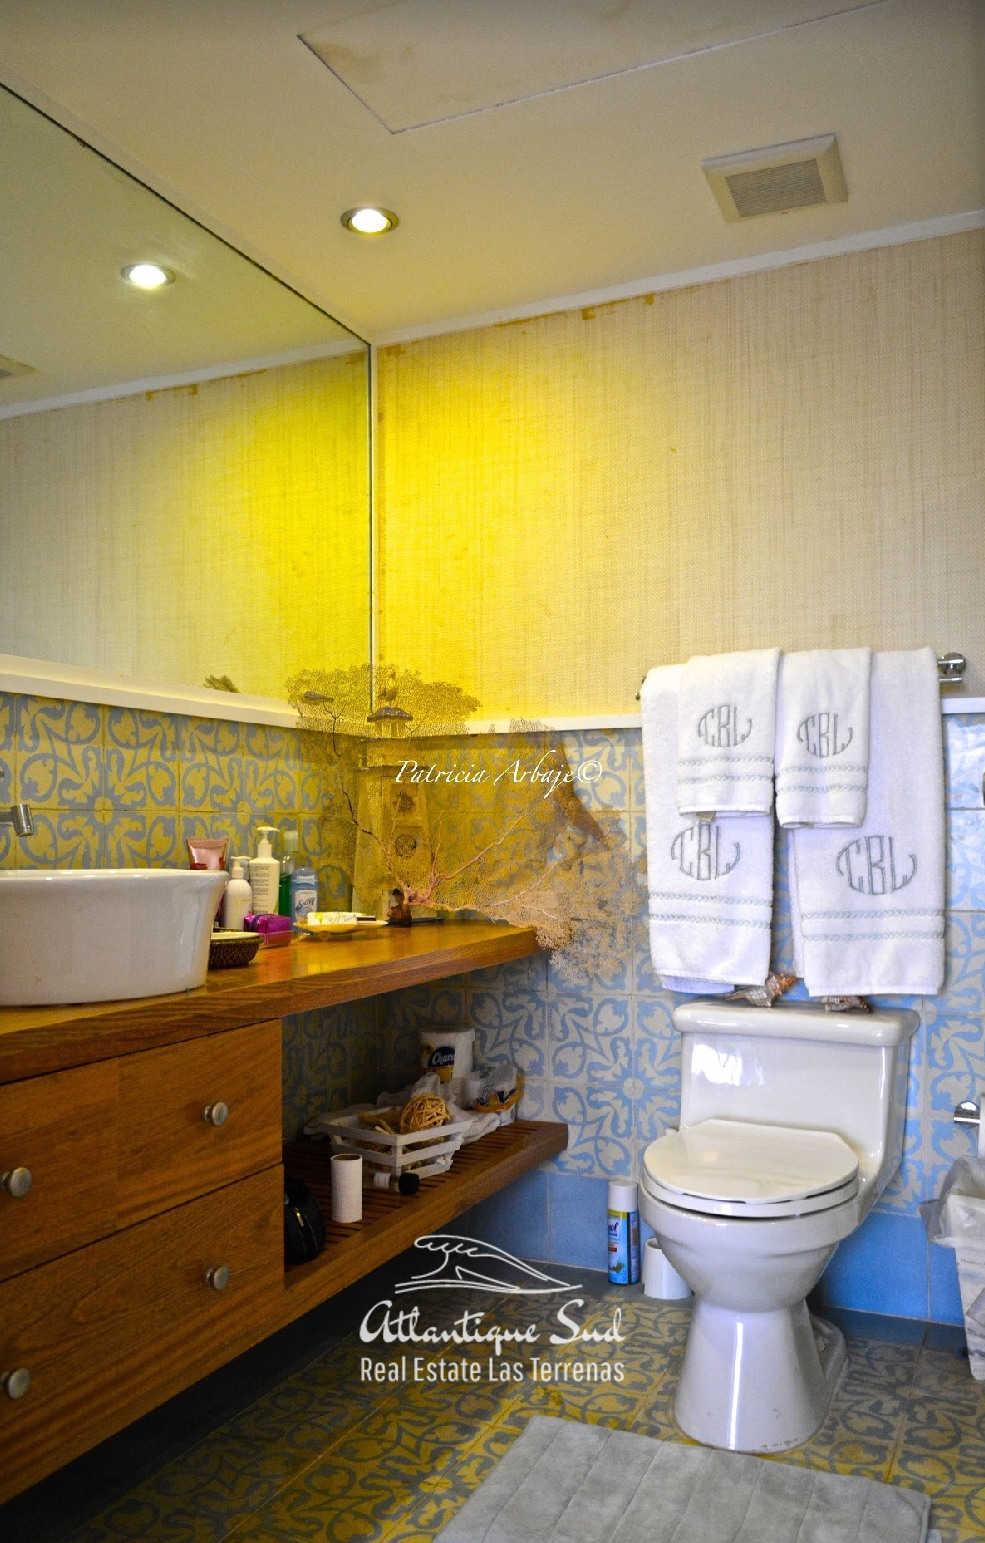 Spacious apartment with marina in samana7.jpg